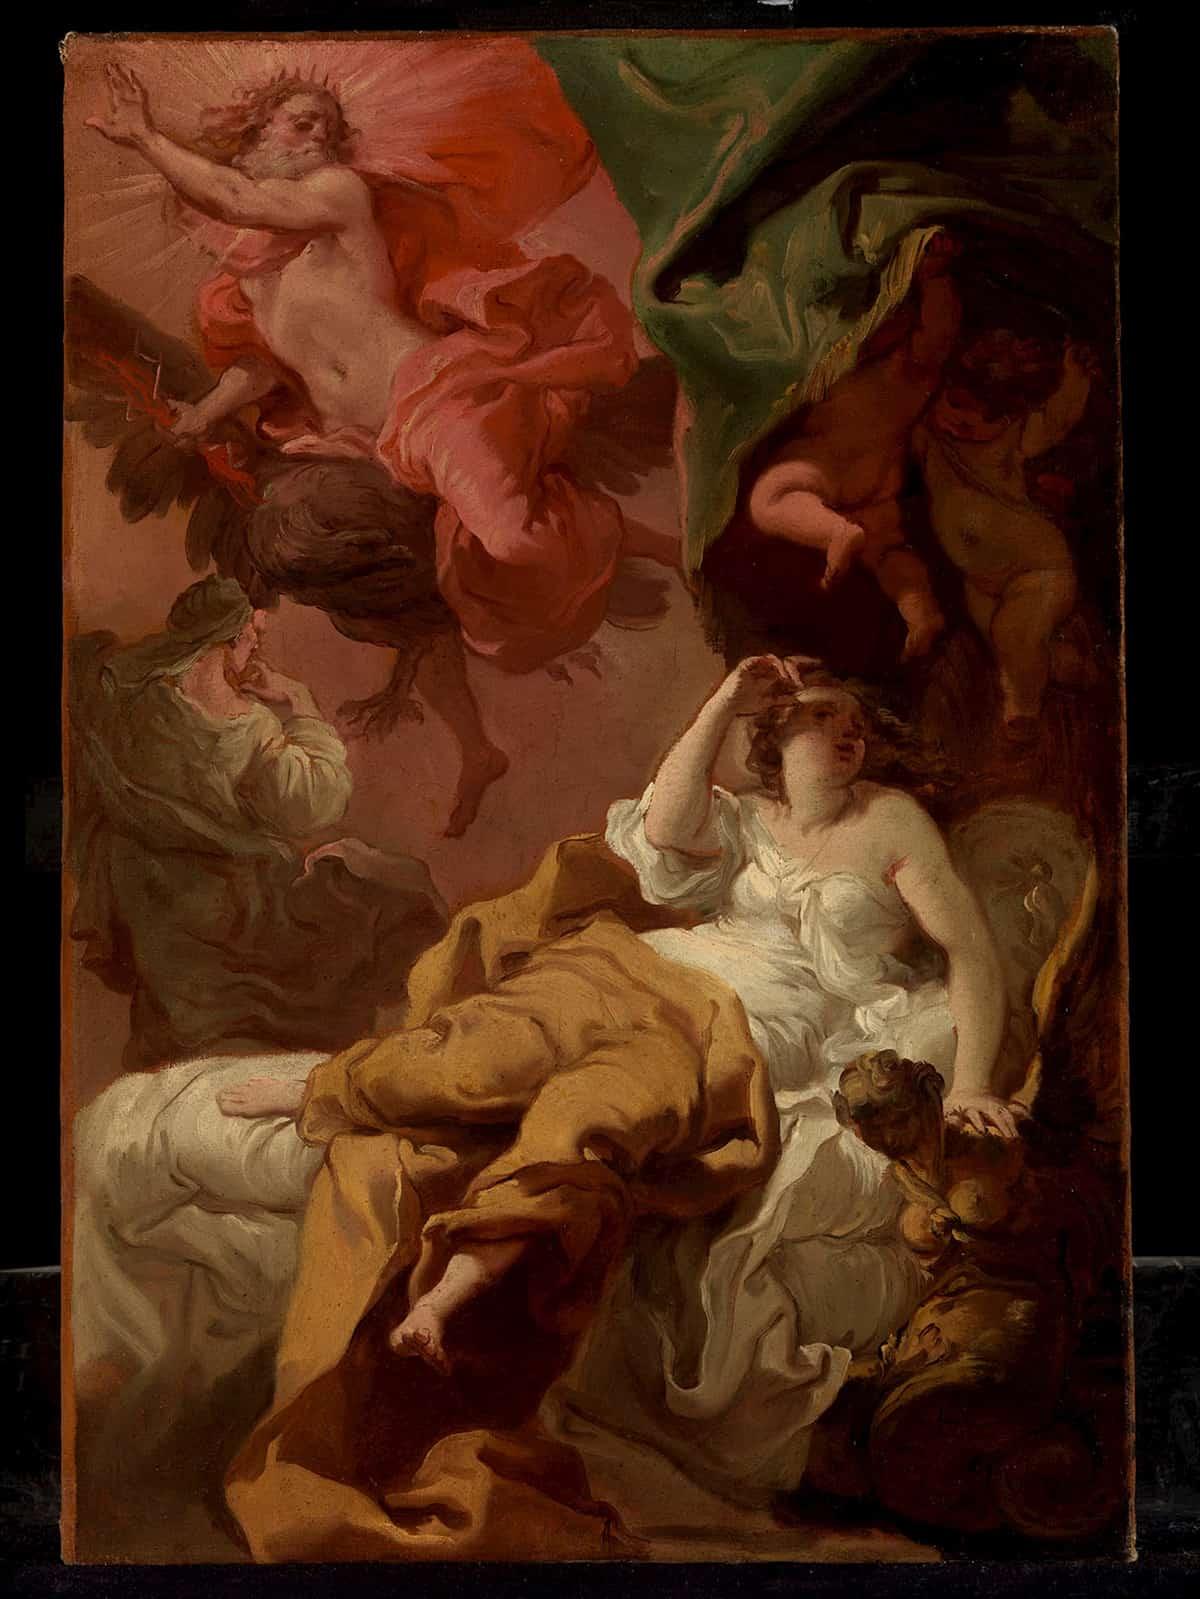 Jupiter and Semele by Gaetano Gandolfi, 1770 at Walter Padovani